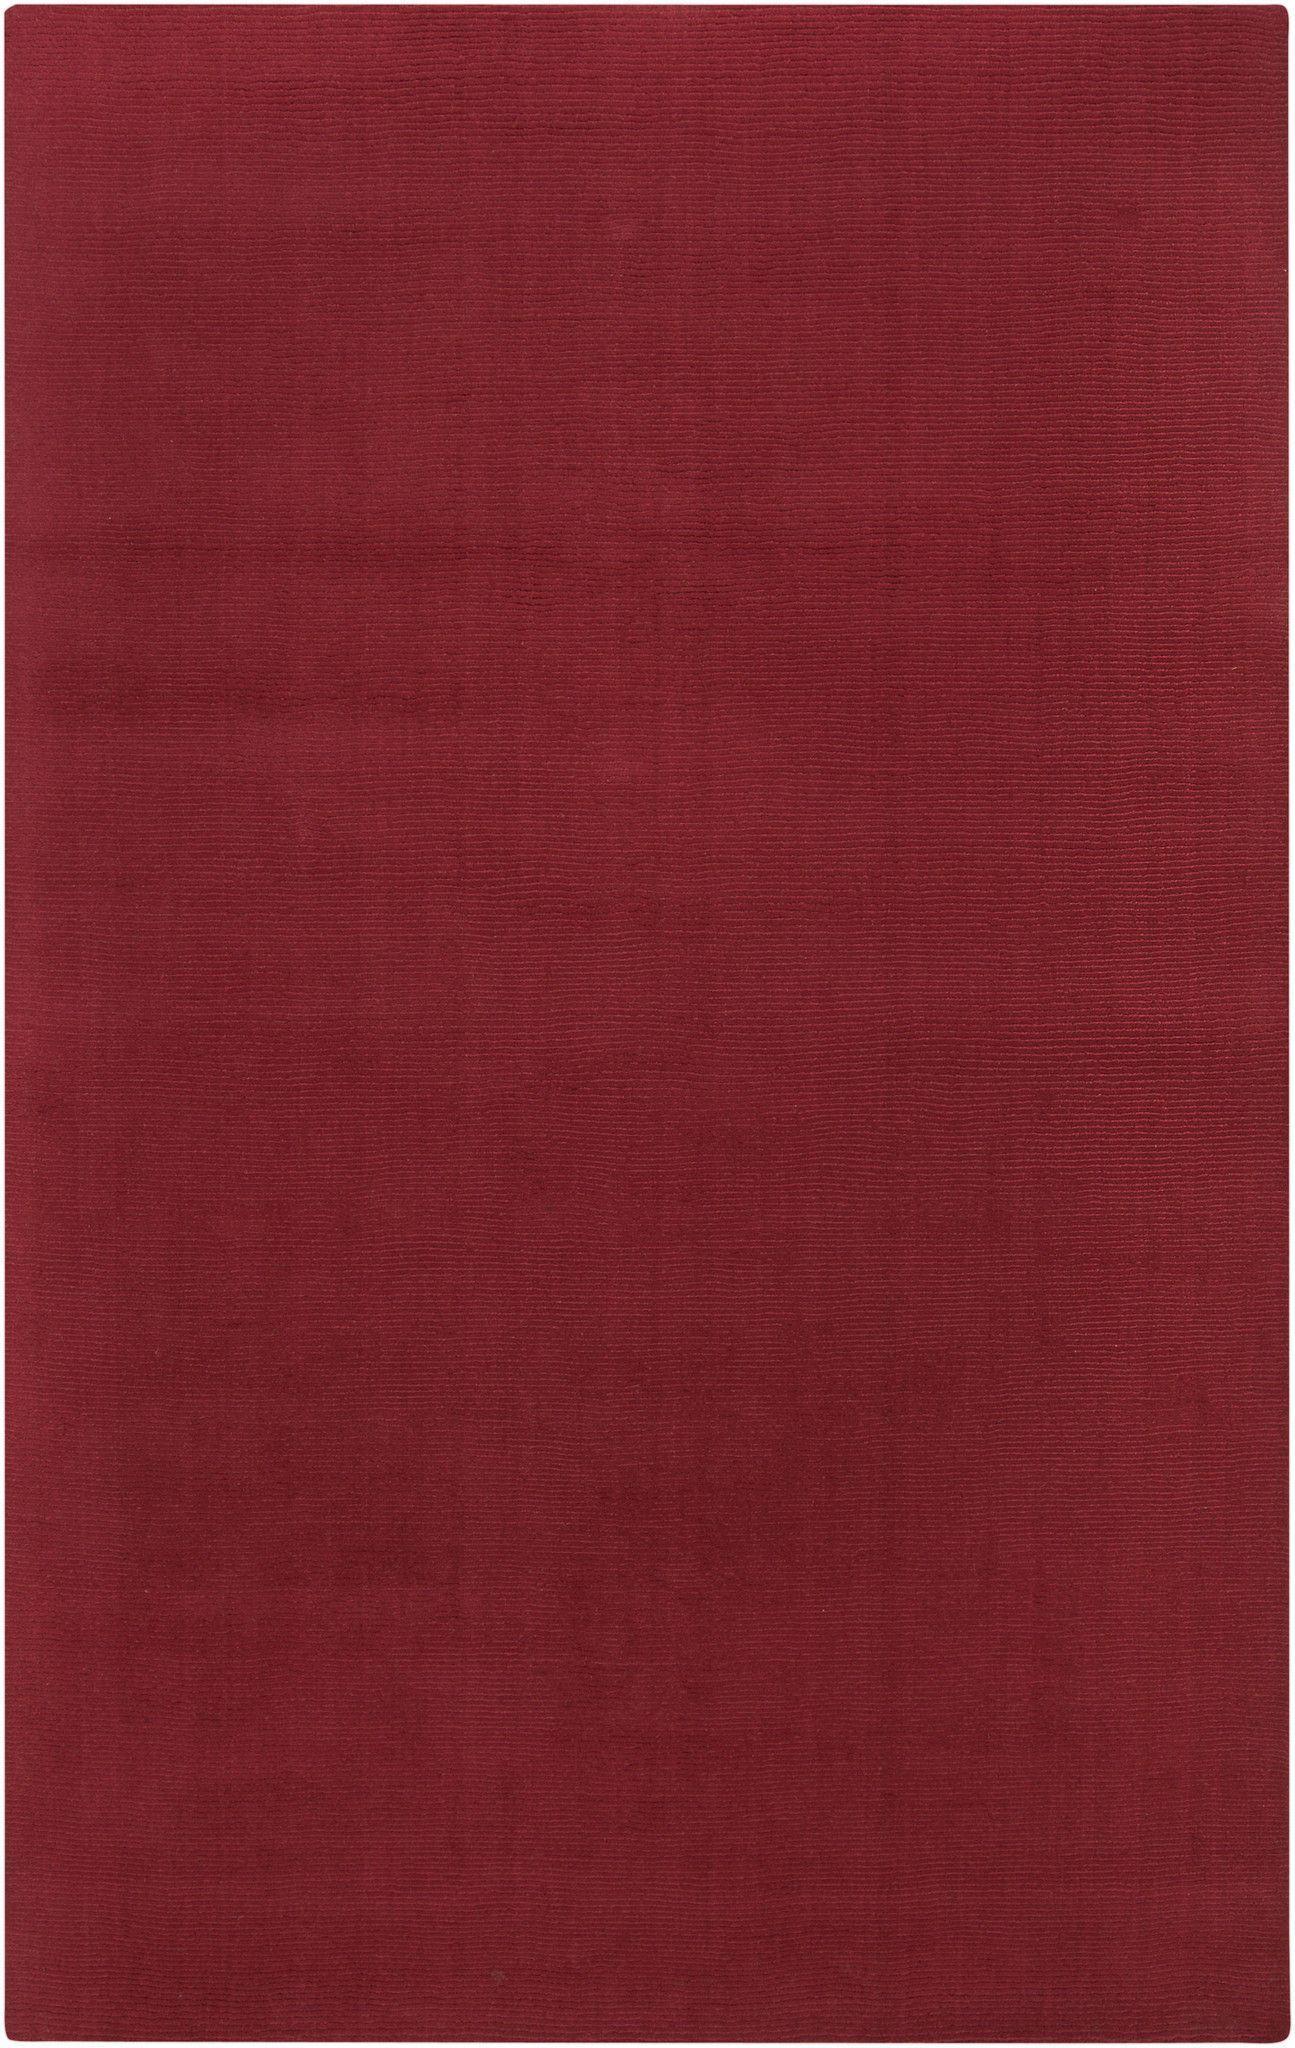 Surya M333 Mystique Red Rectangle Area Rug